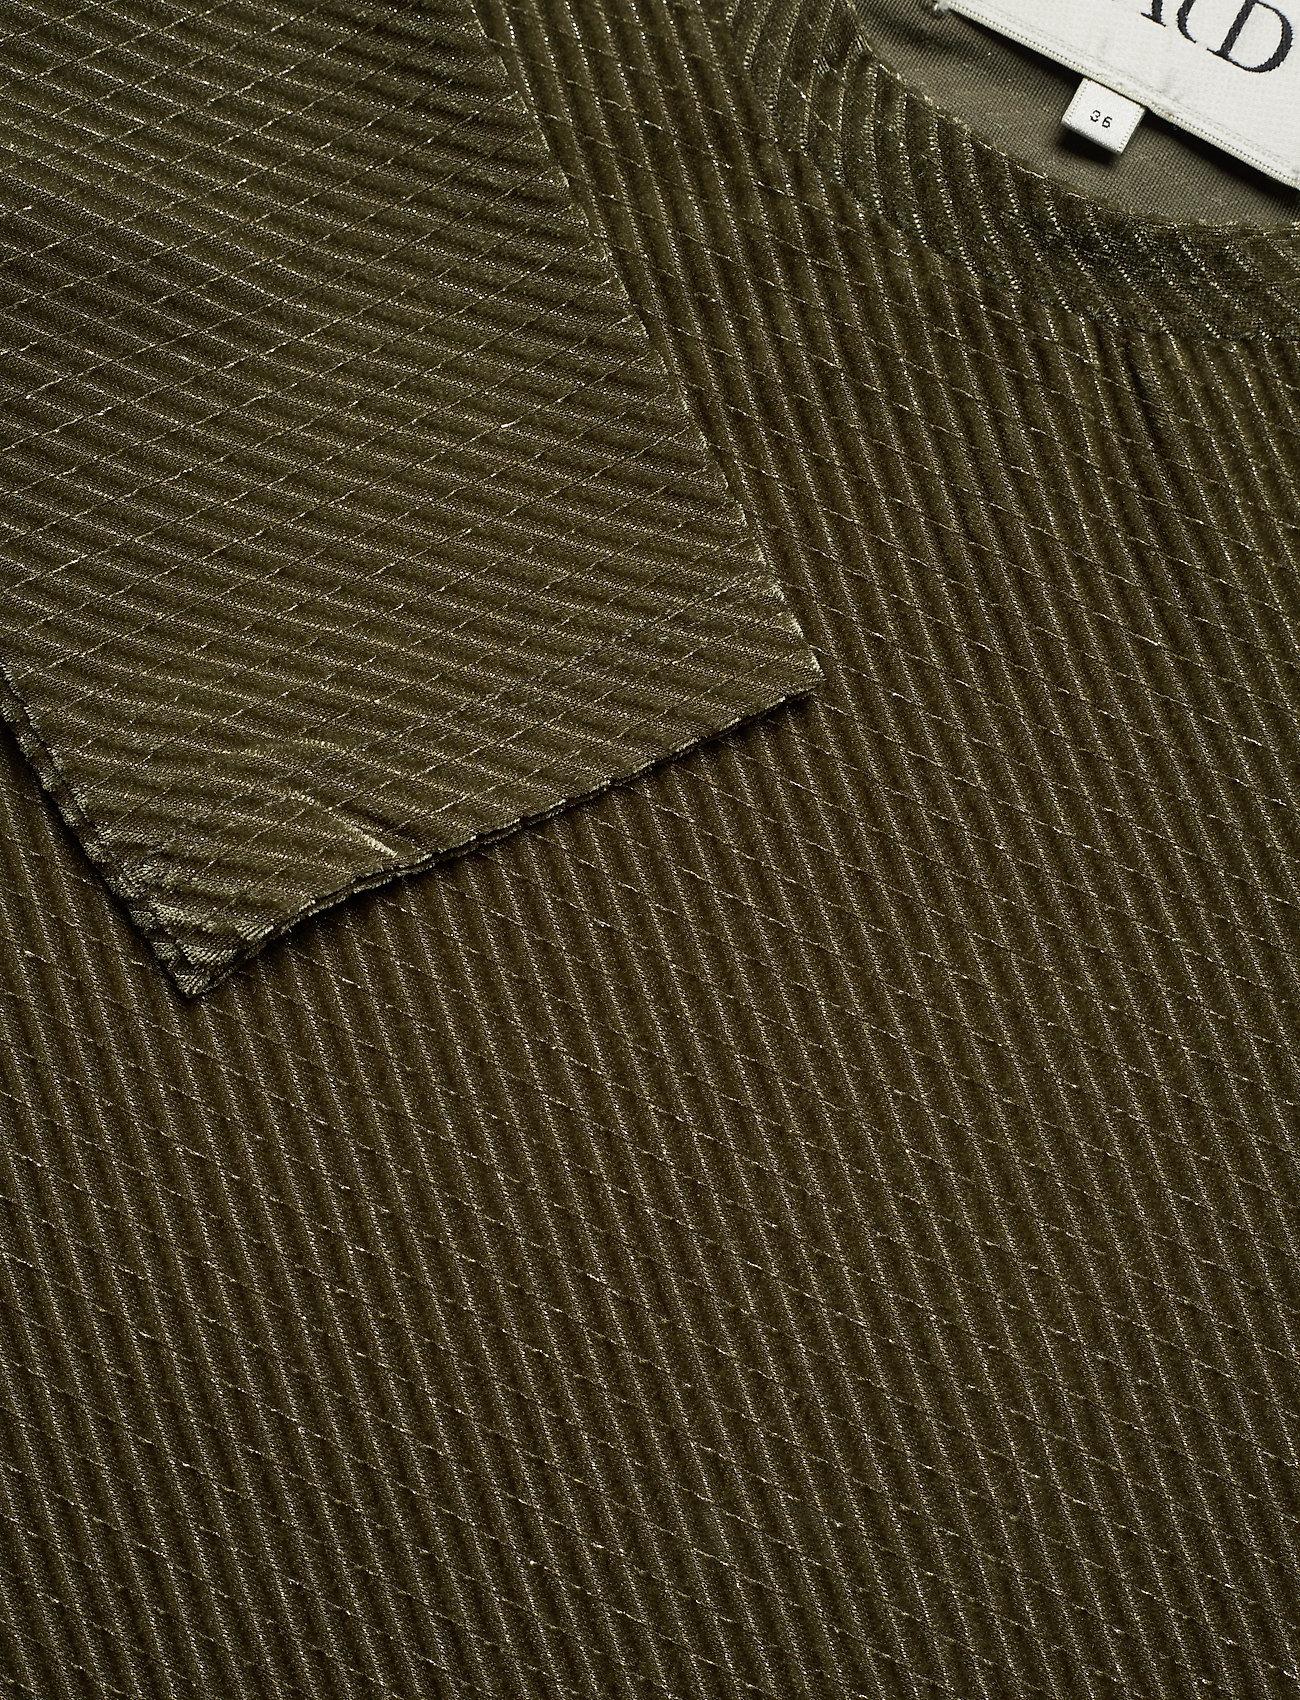 Striped Puffa Top (Vetiver) (109 €) - MAUD aWh3z